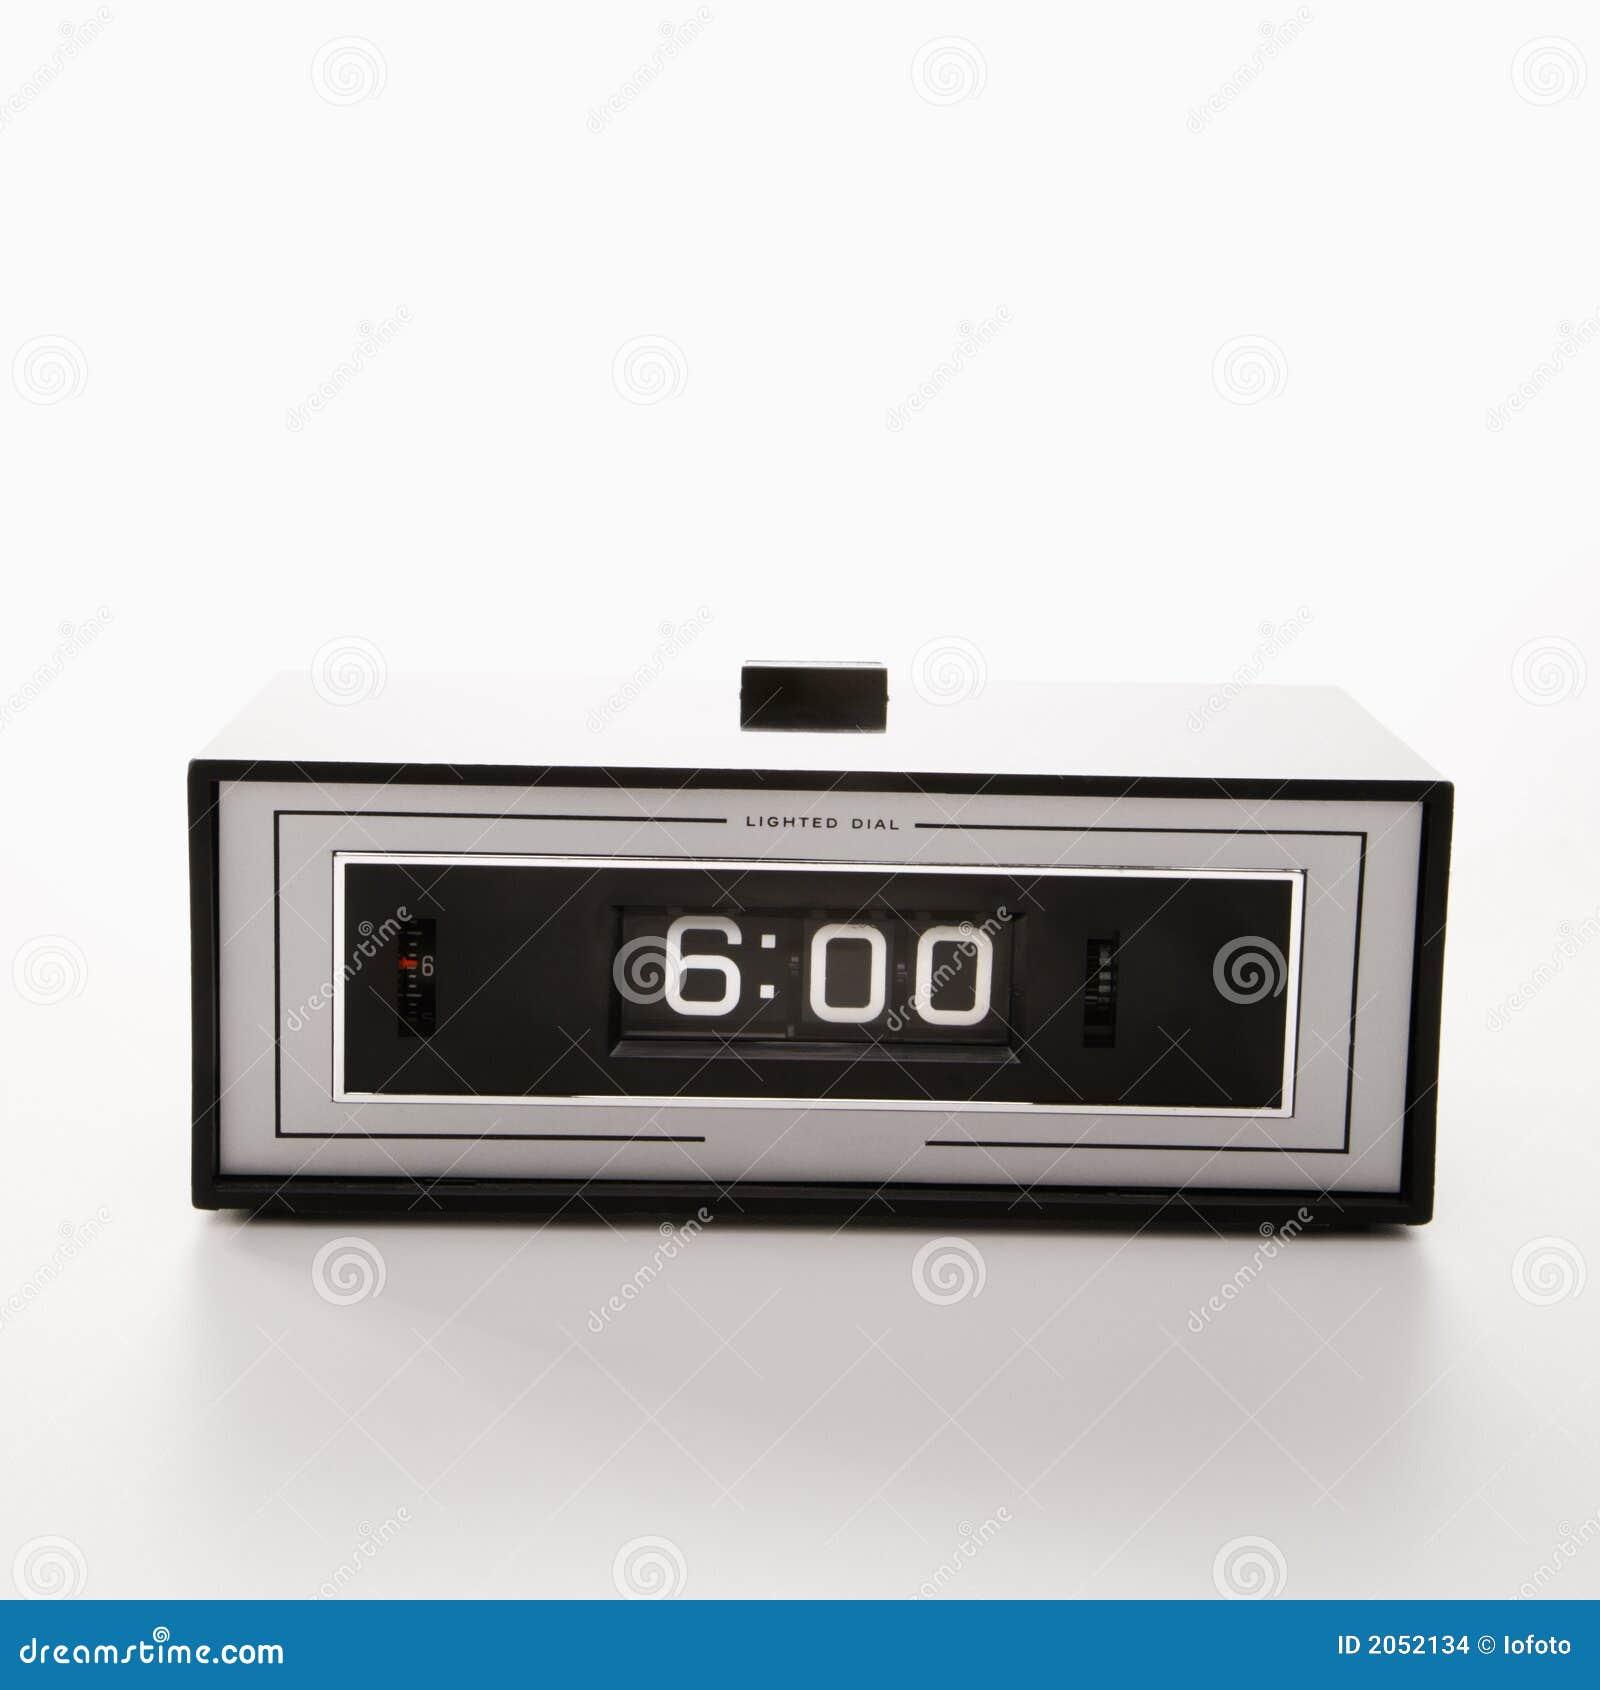 Clock set for 6:00.